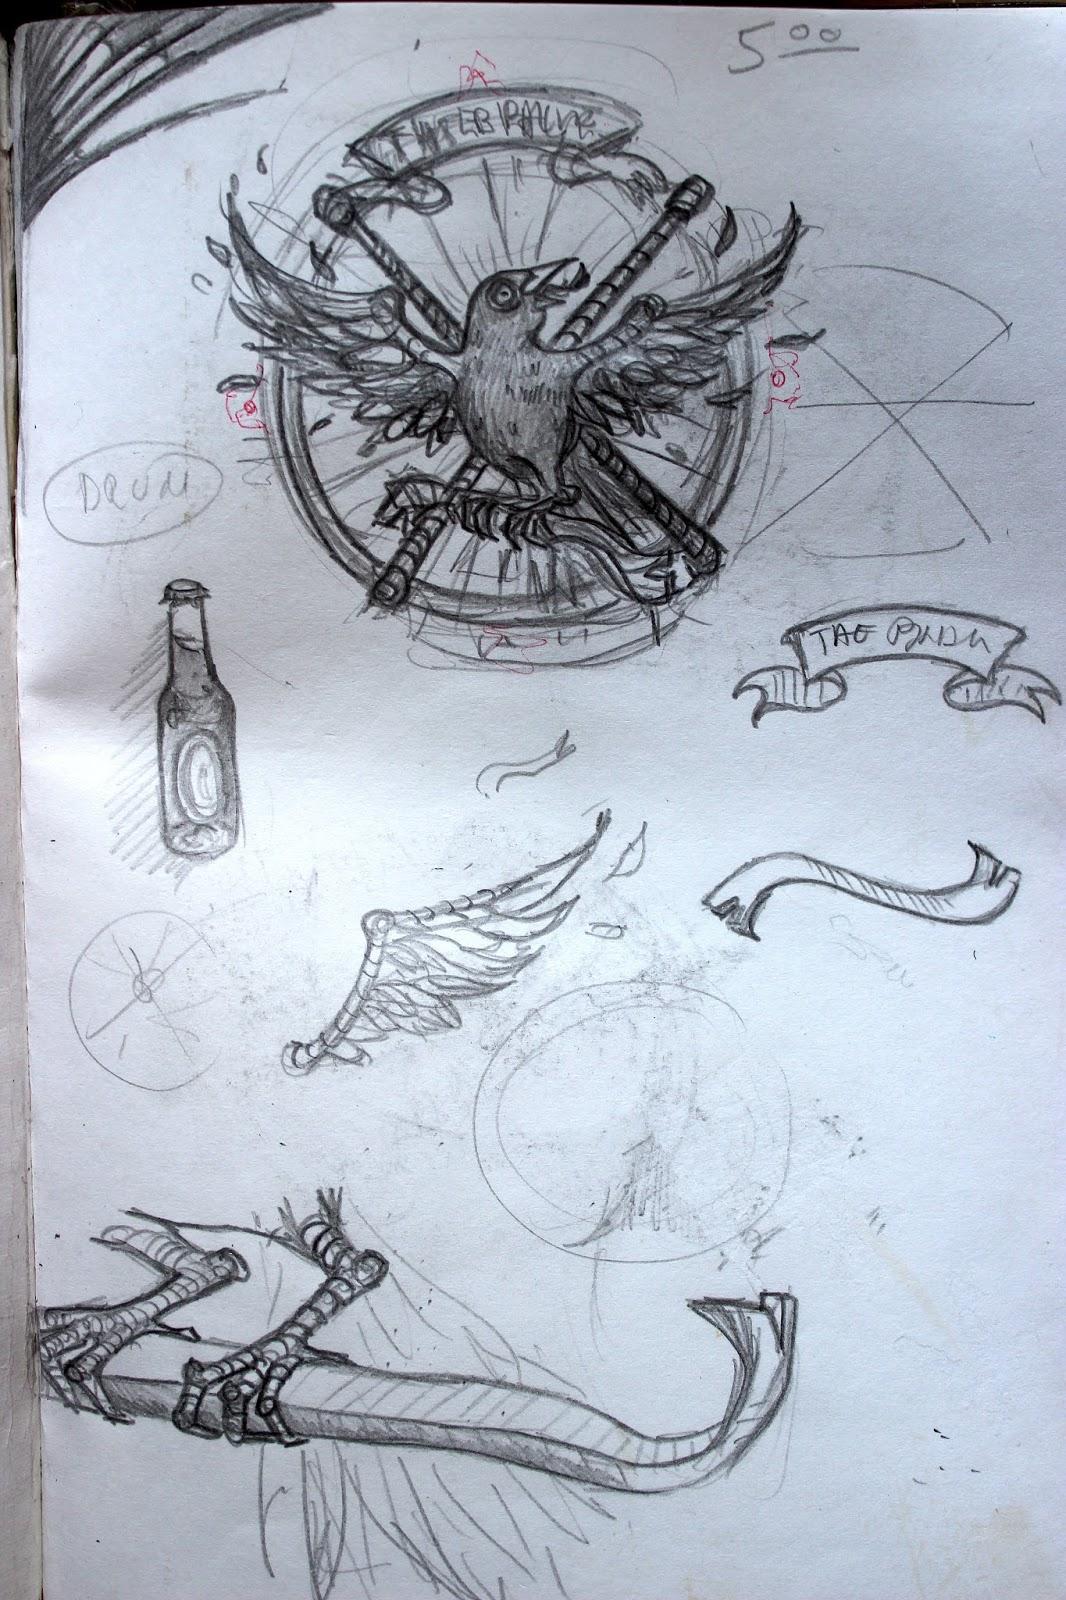 Sketchpad Notebook Sketch Drawing Pencil Crowbar